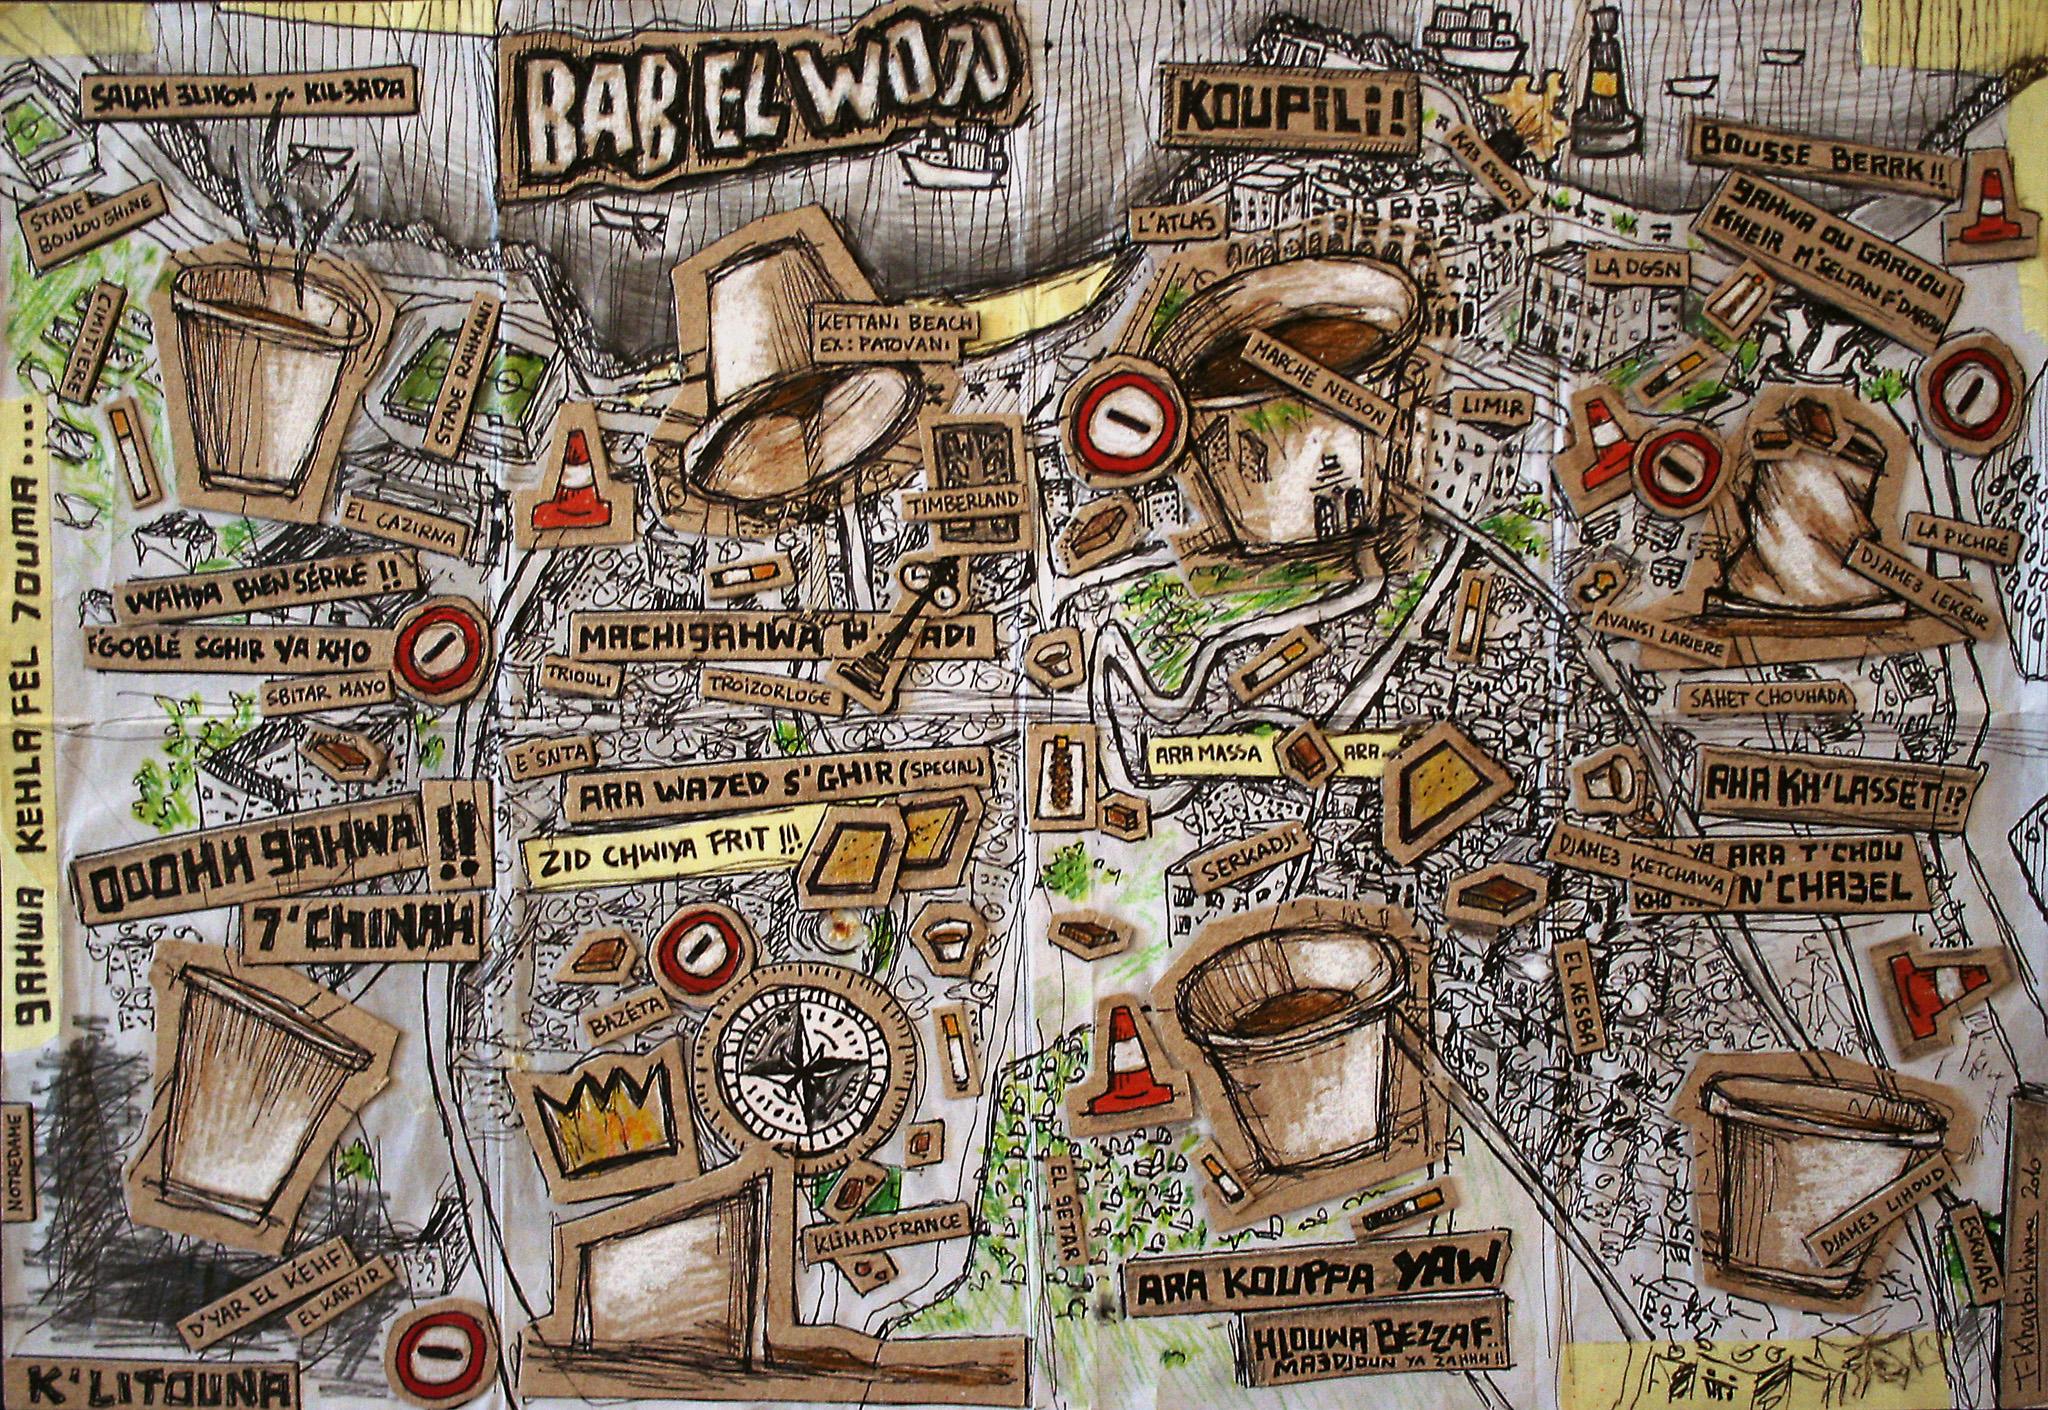 Bab el wood